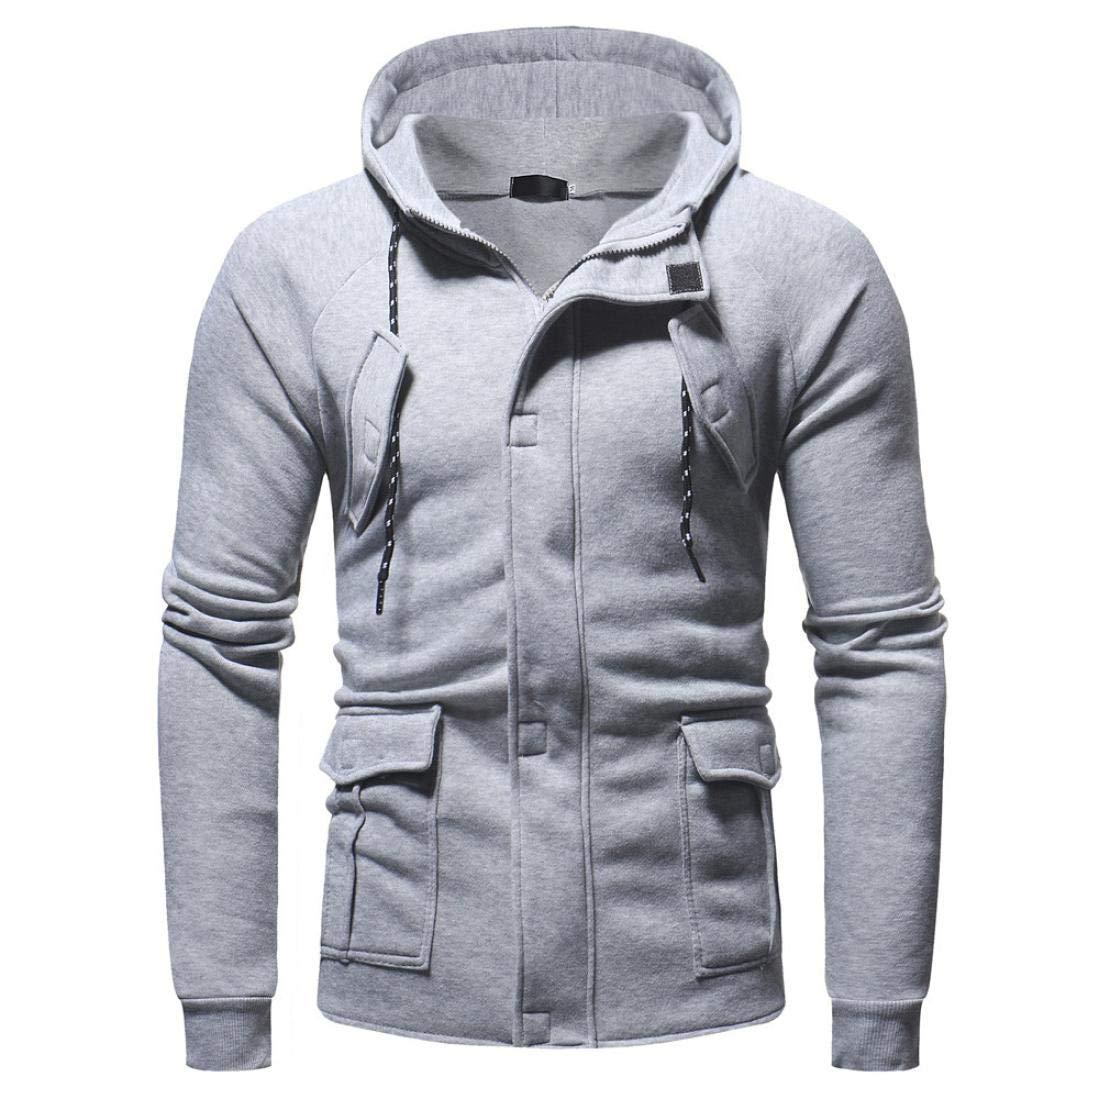 Corriee Men Hoodies Coat Mens Autumn Winter Casual Long Sleeve Zipper Pocket Party Blouse Fashion Warm Hooded Coat